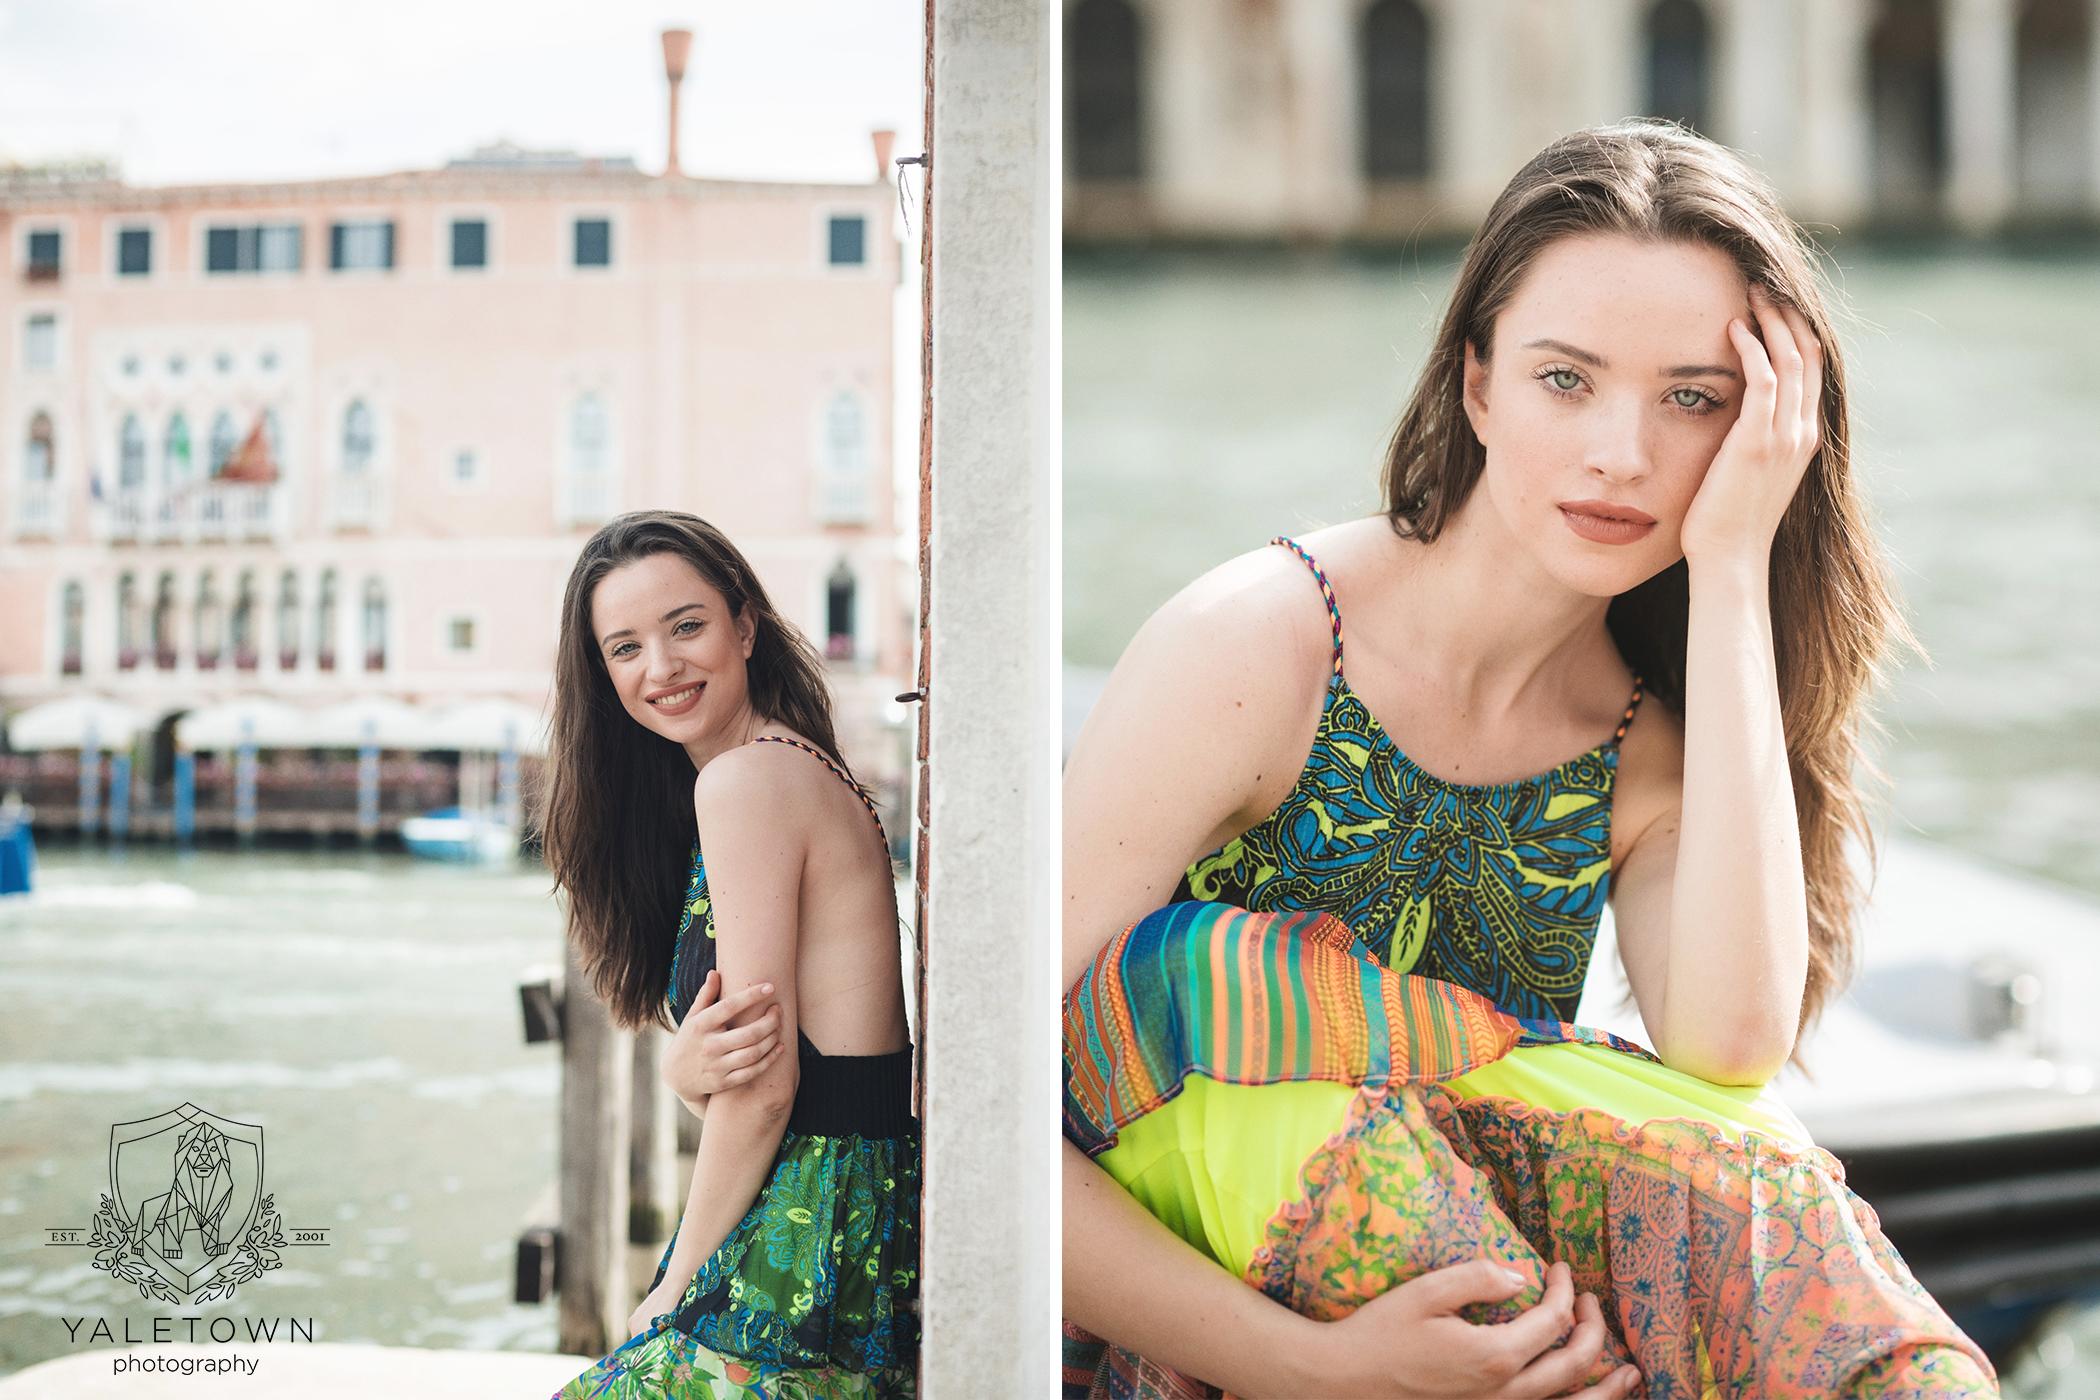 Venice-portrait-session-yaletown-photography-vacation-photographer-photo-020.jpg